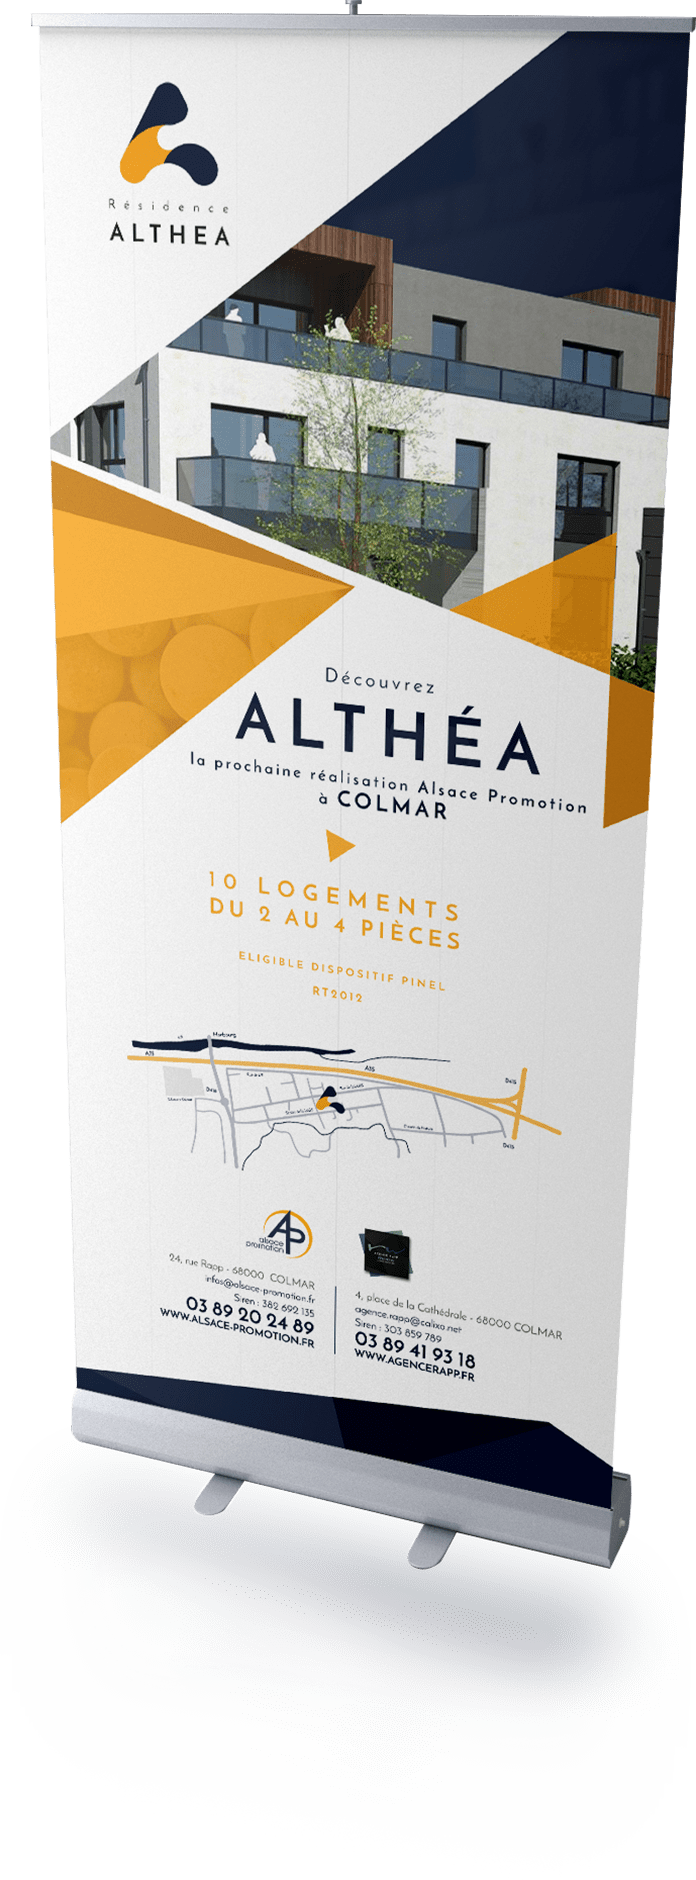 Roll up de la Résidence Althea